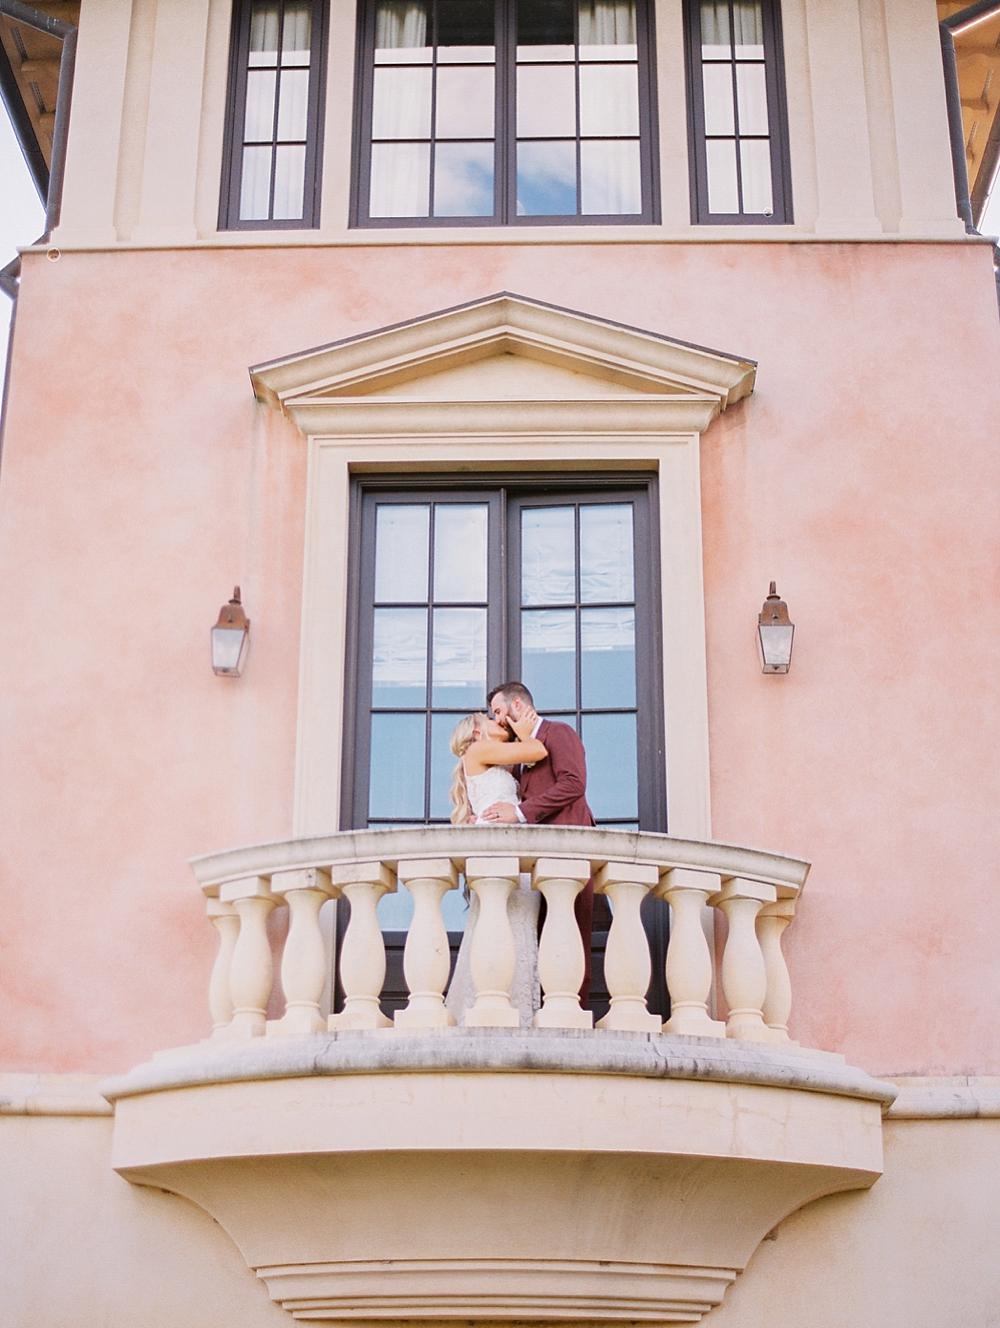 kristin-la-voie-photography-AUSTIN-WEDDING-PHOTOGRAPHER-BEST-IN-TEXAS-184